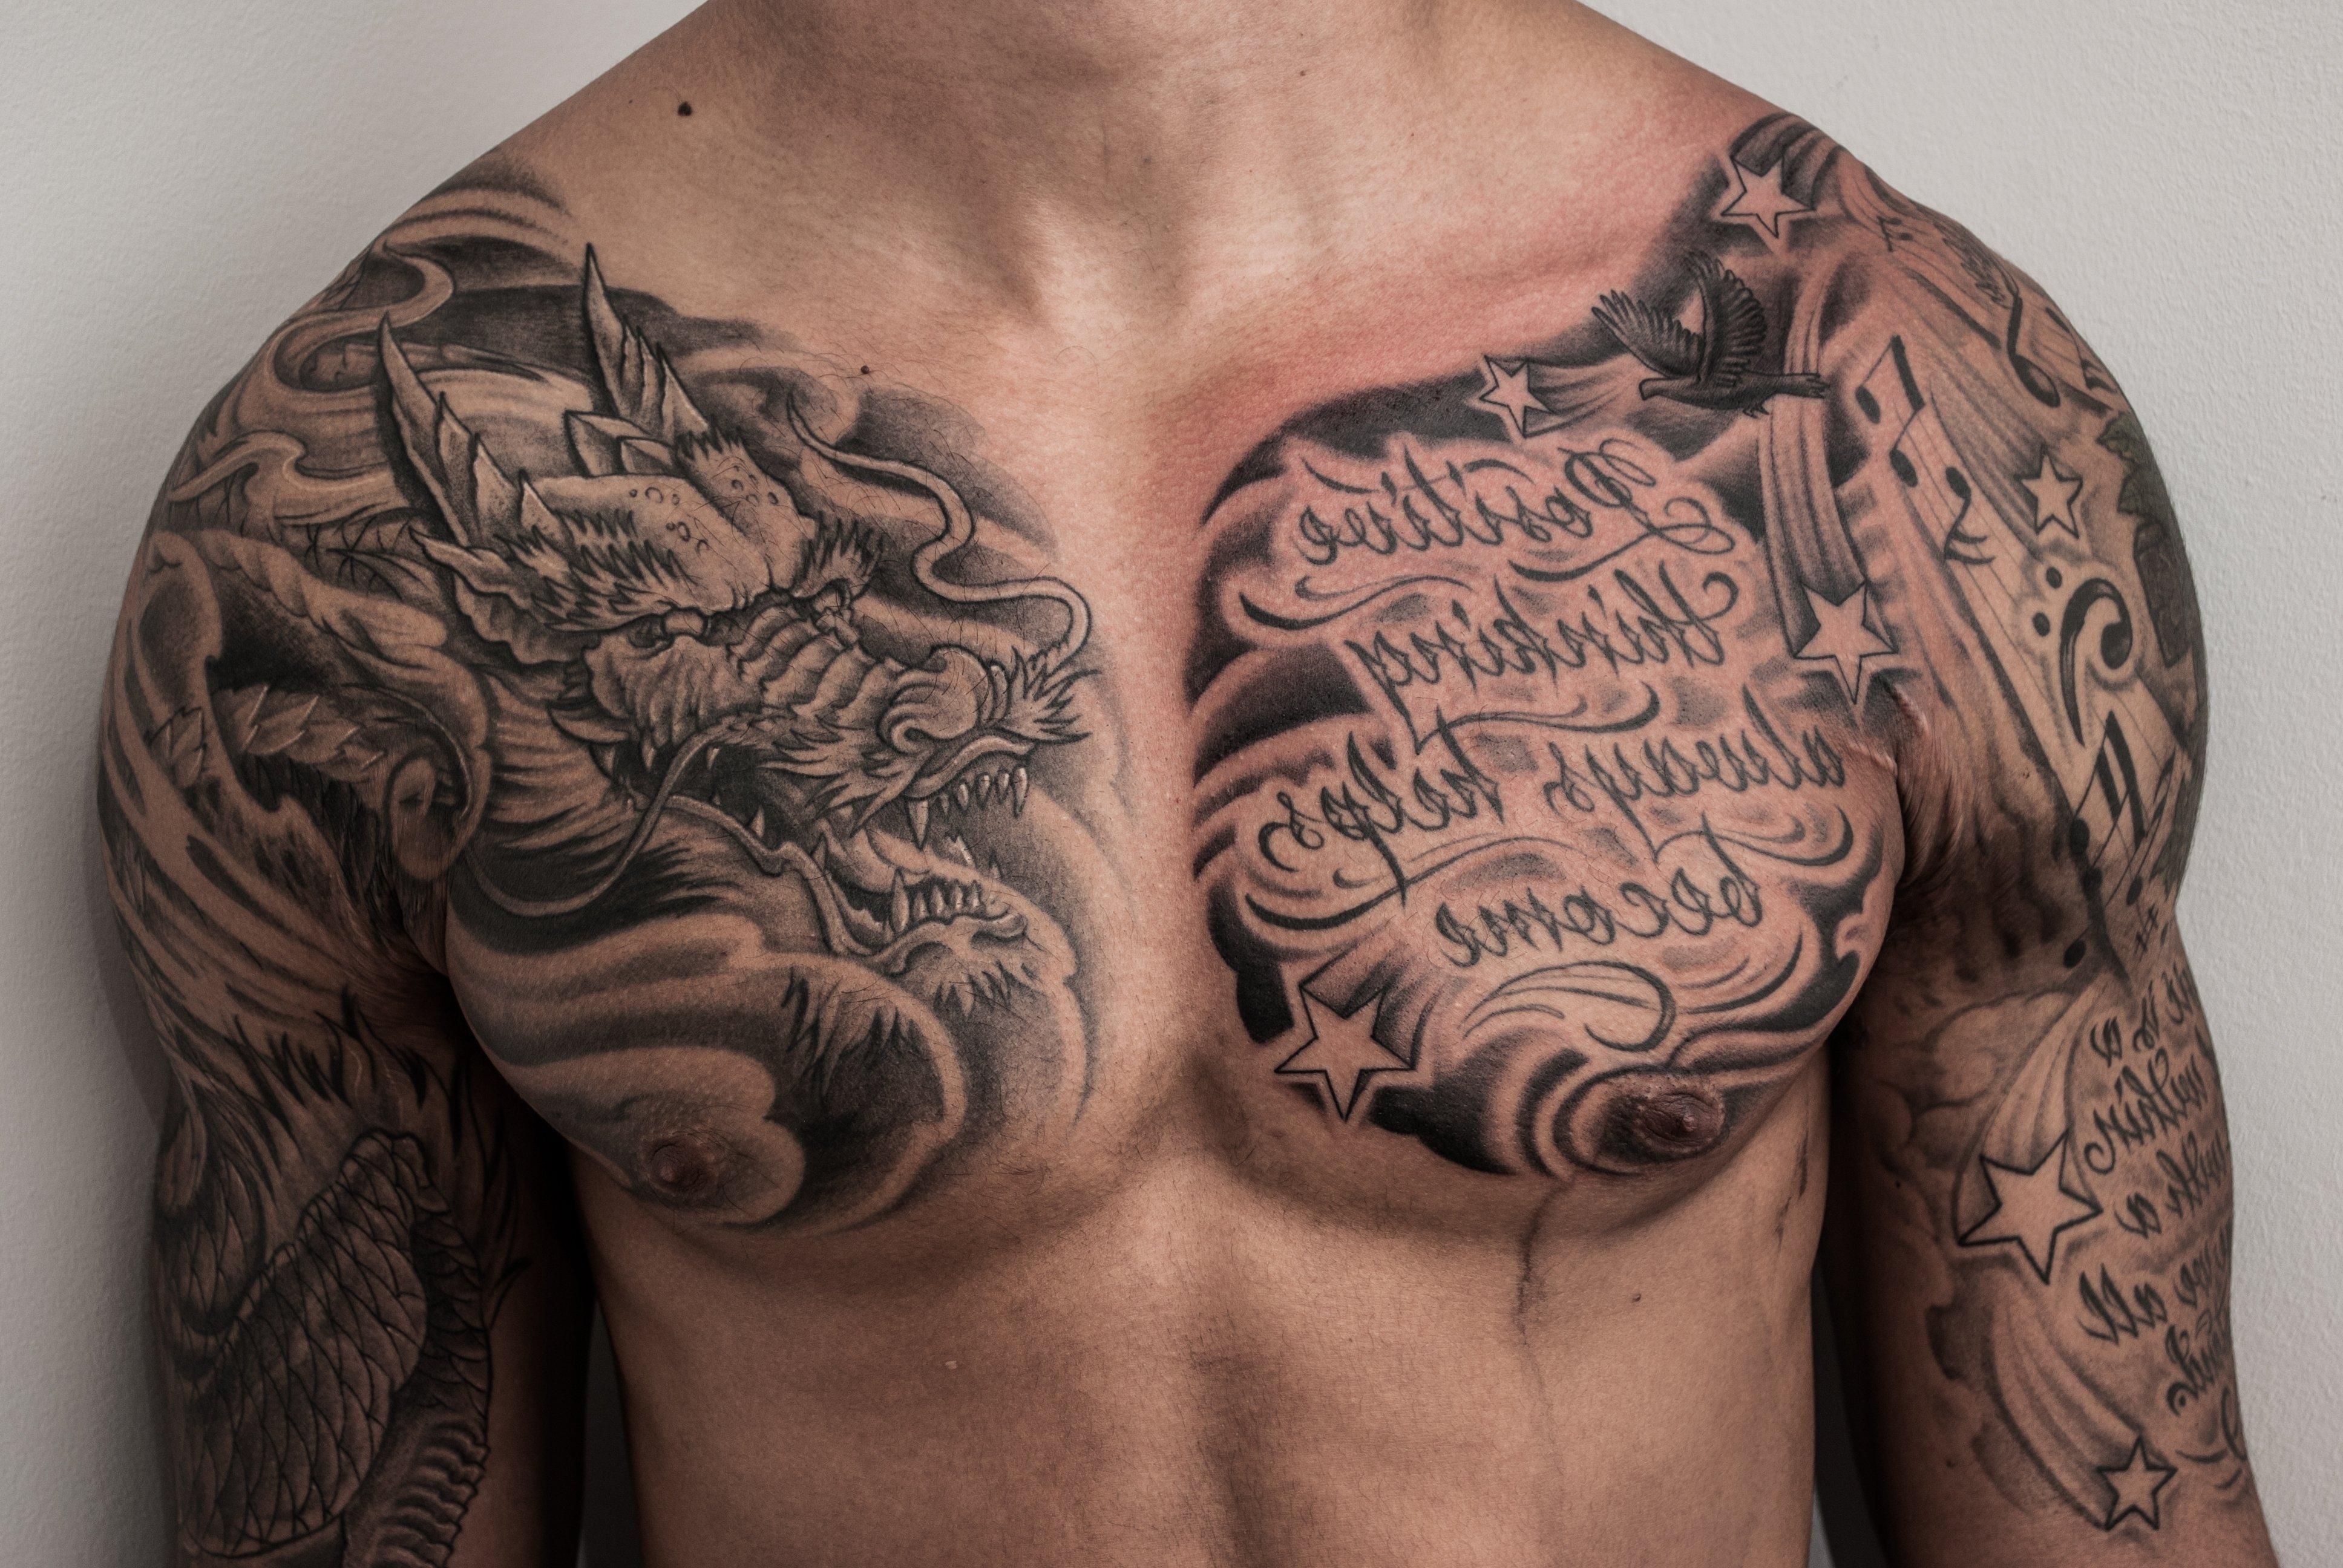 10 Wonderful Good Tattoo Ideas For Men good tattoo ideas for guys tattoos 10 selected tattoos for men 2